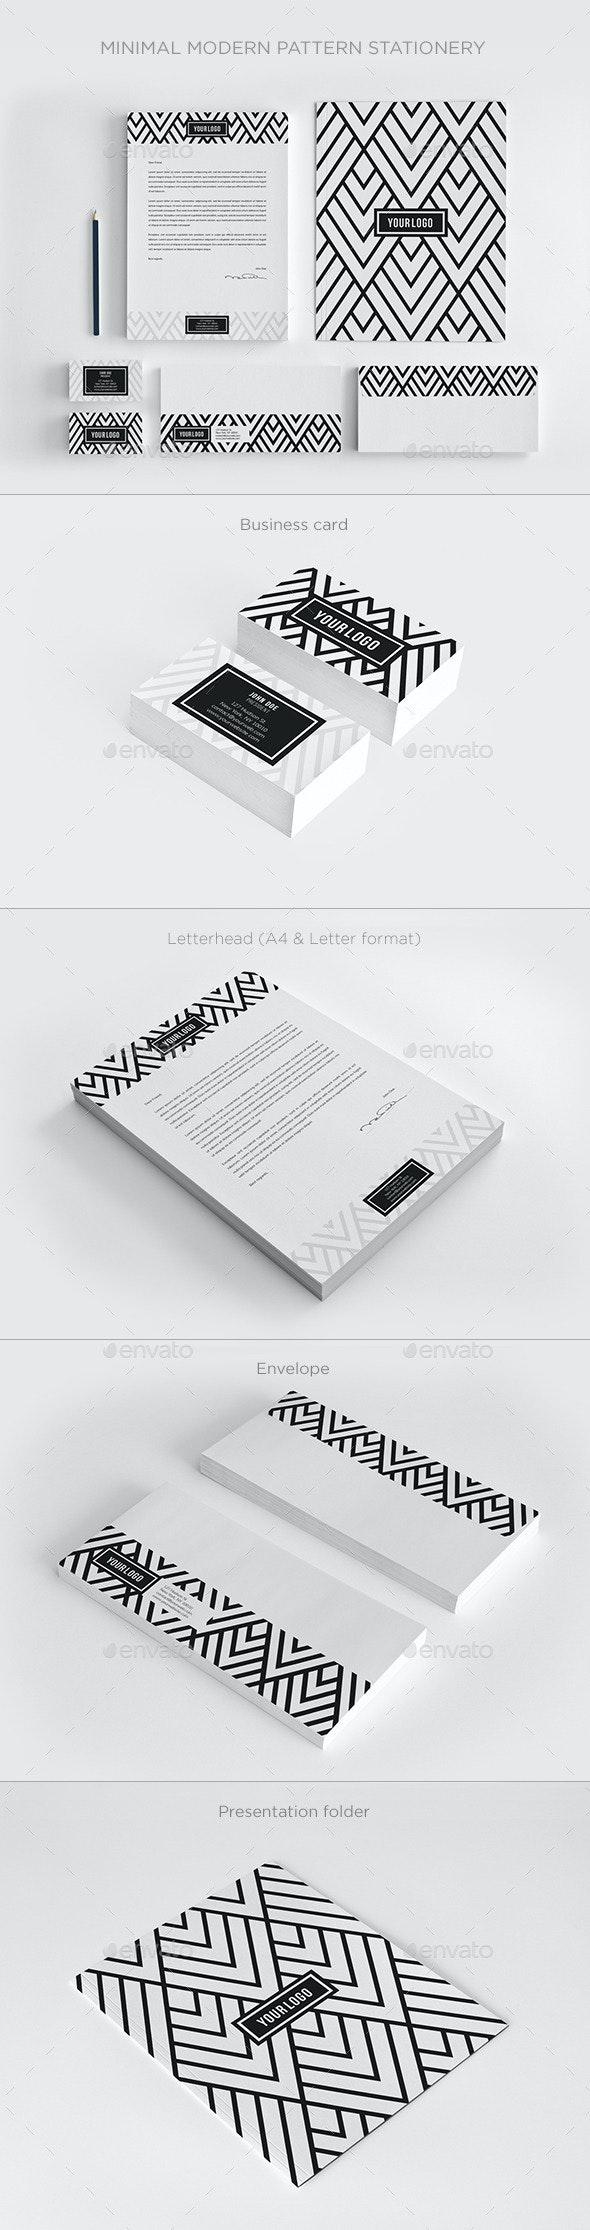 Minimal Modern Pattern Stationery - Stationery Print Templates